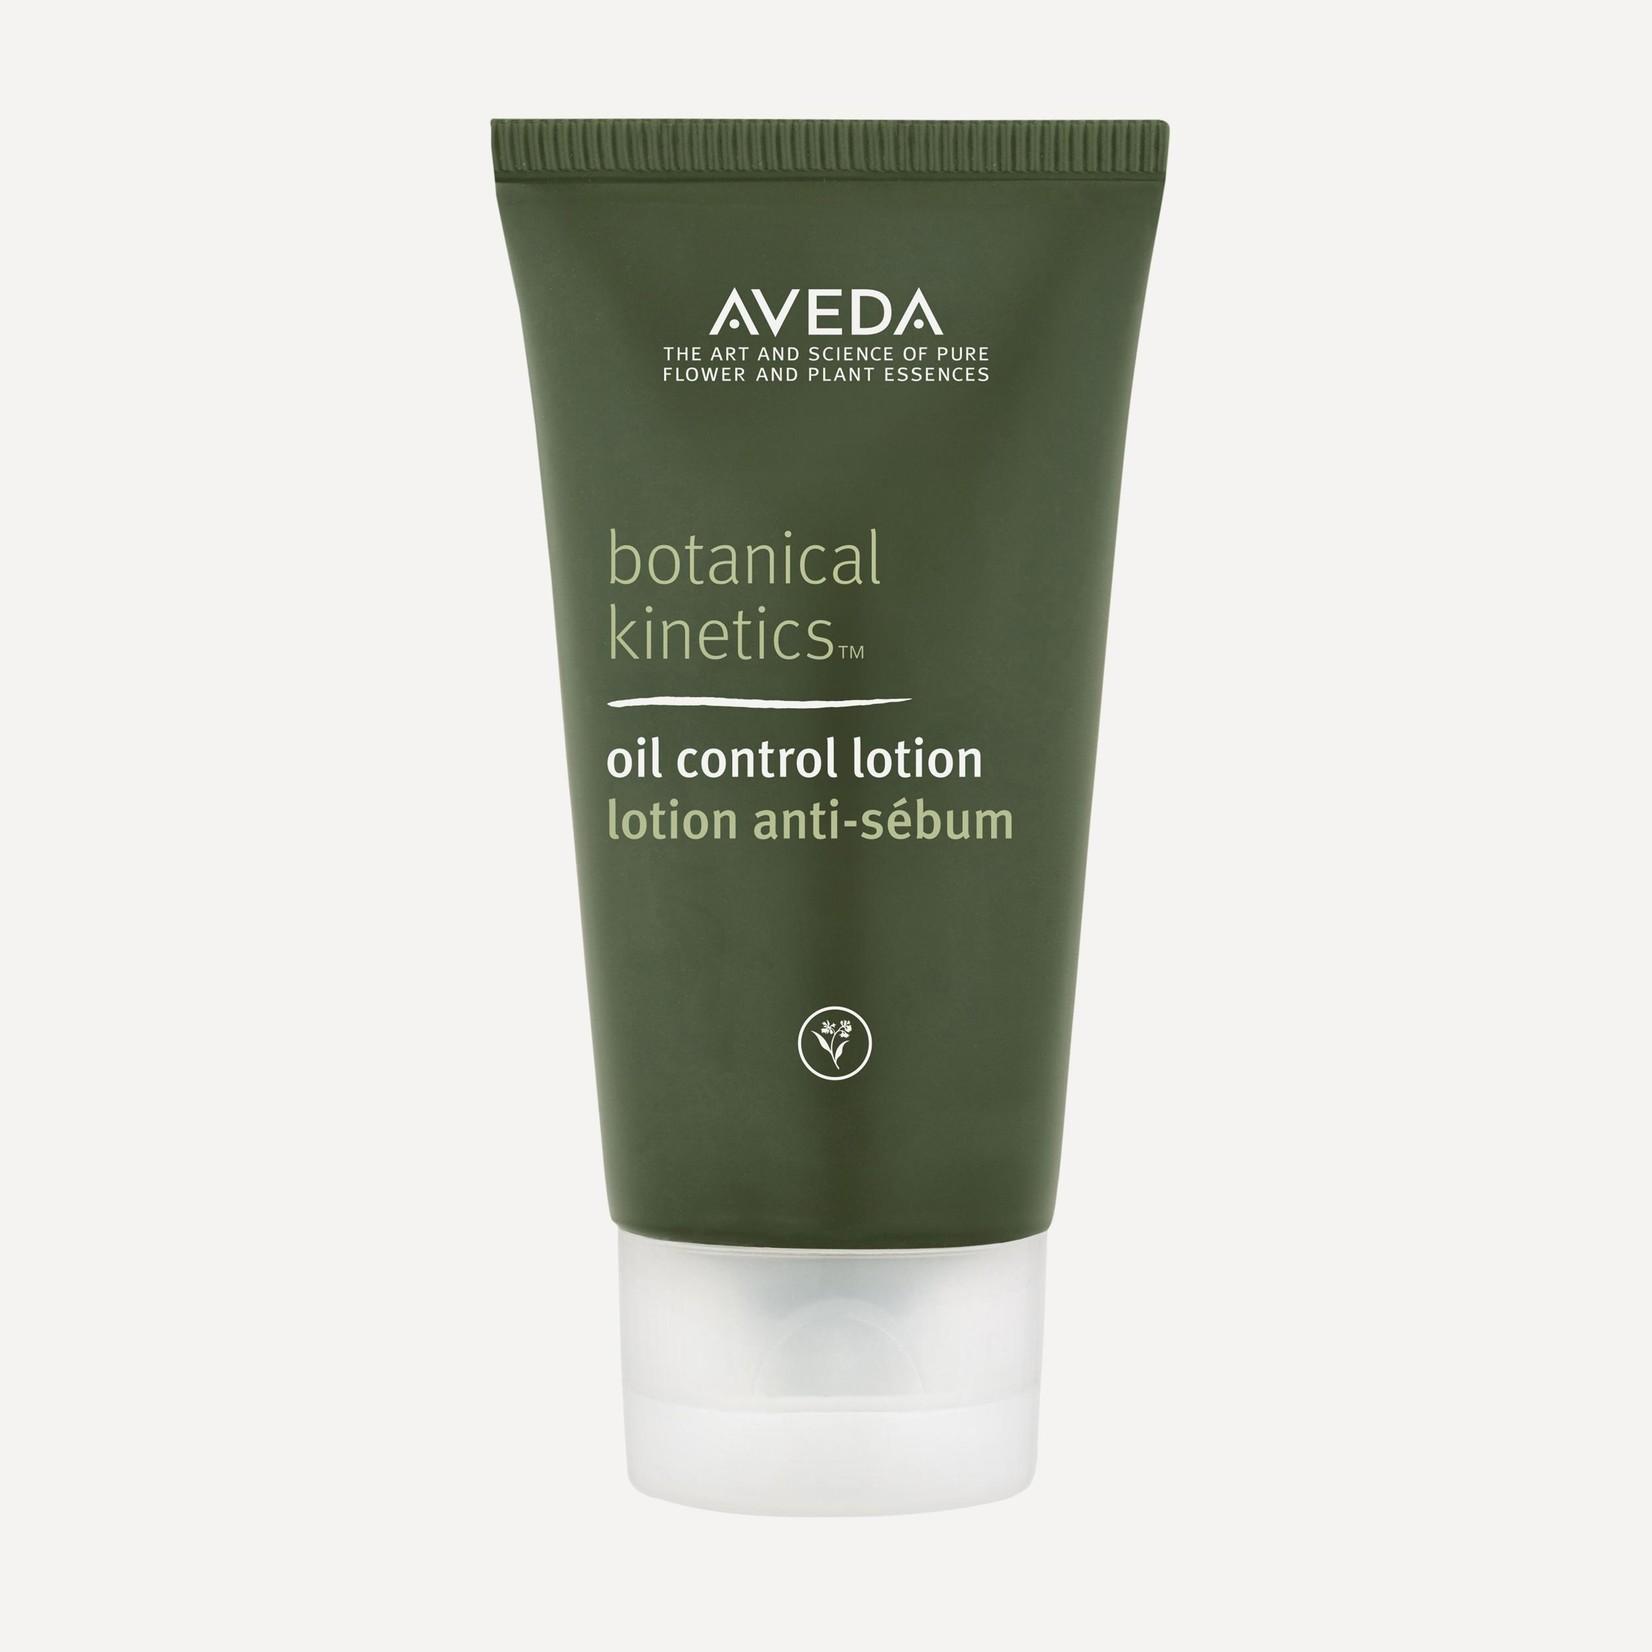 AVEDA Botanical Kinetics™ Oil Control Lotion